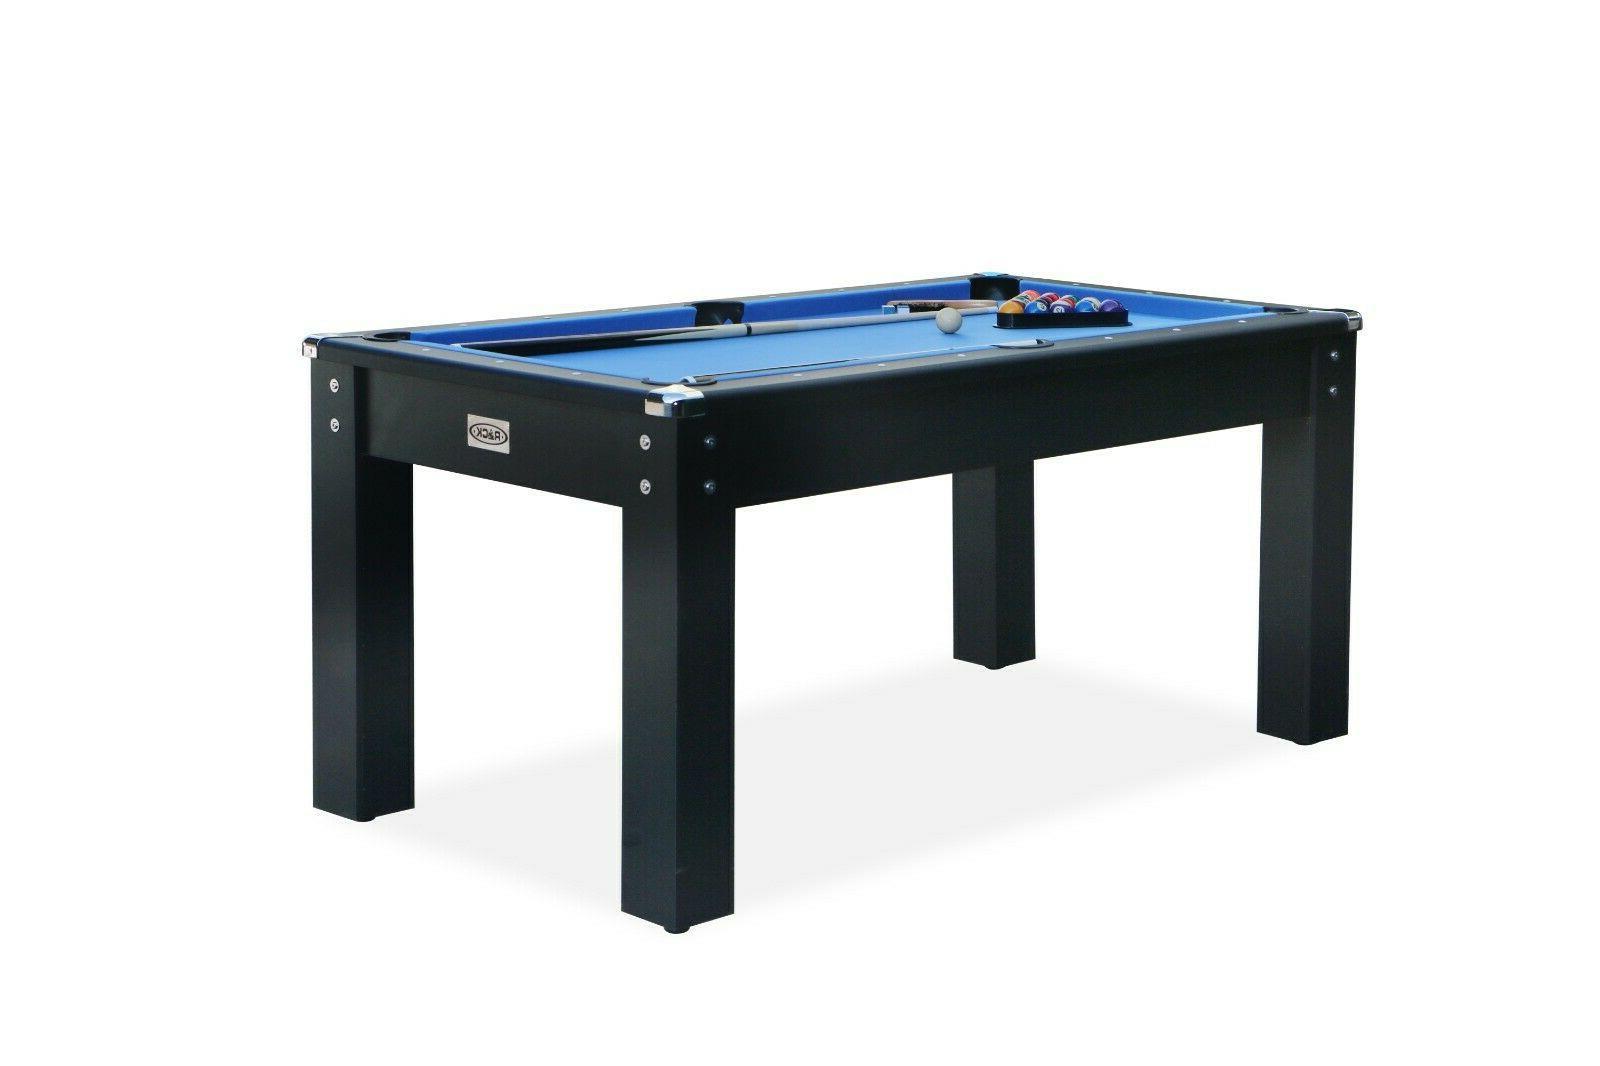 RACK Bolton 5.5-Foot Table